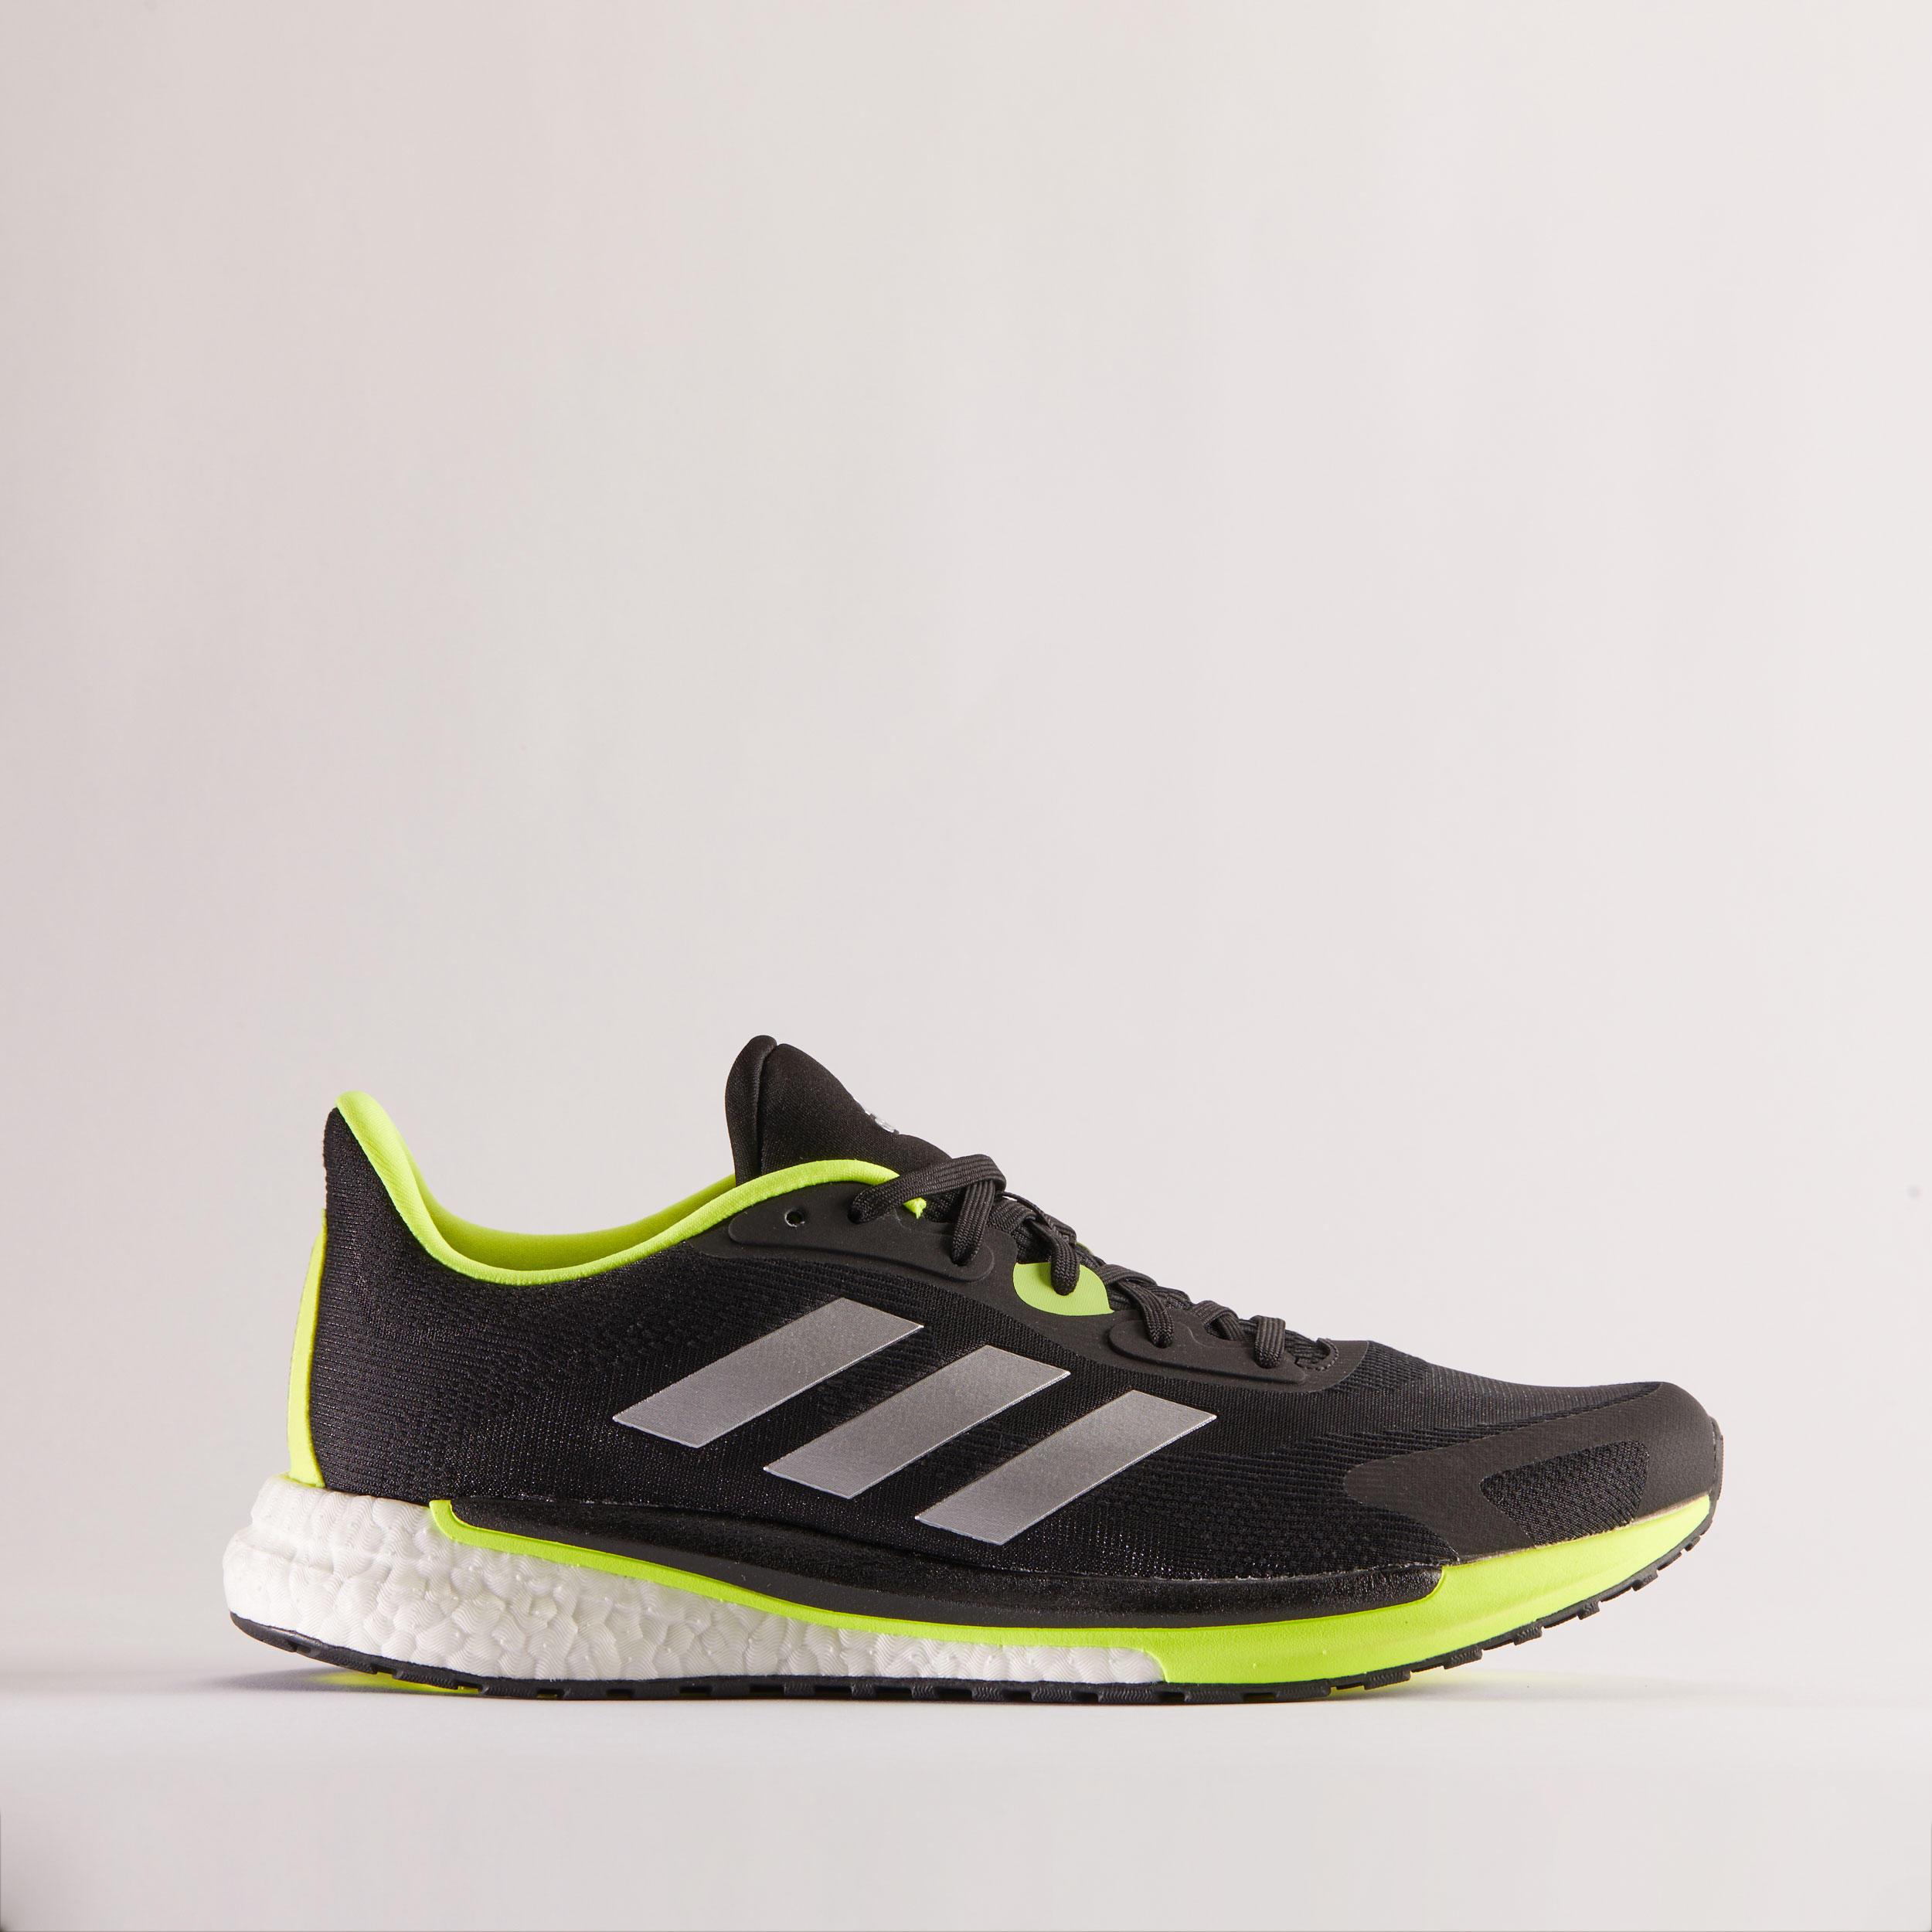 Chaussures homme Adidas | Decathlon